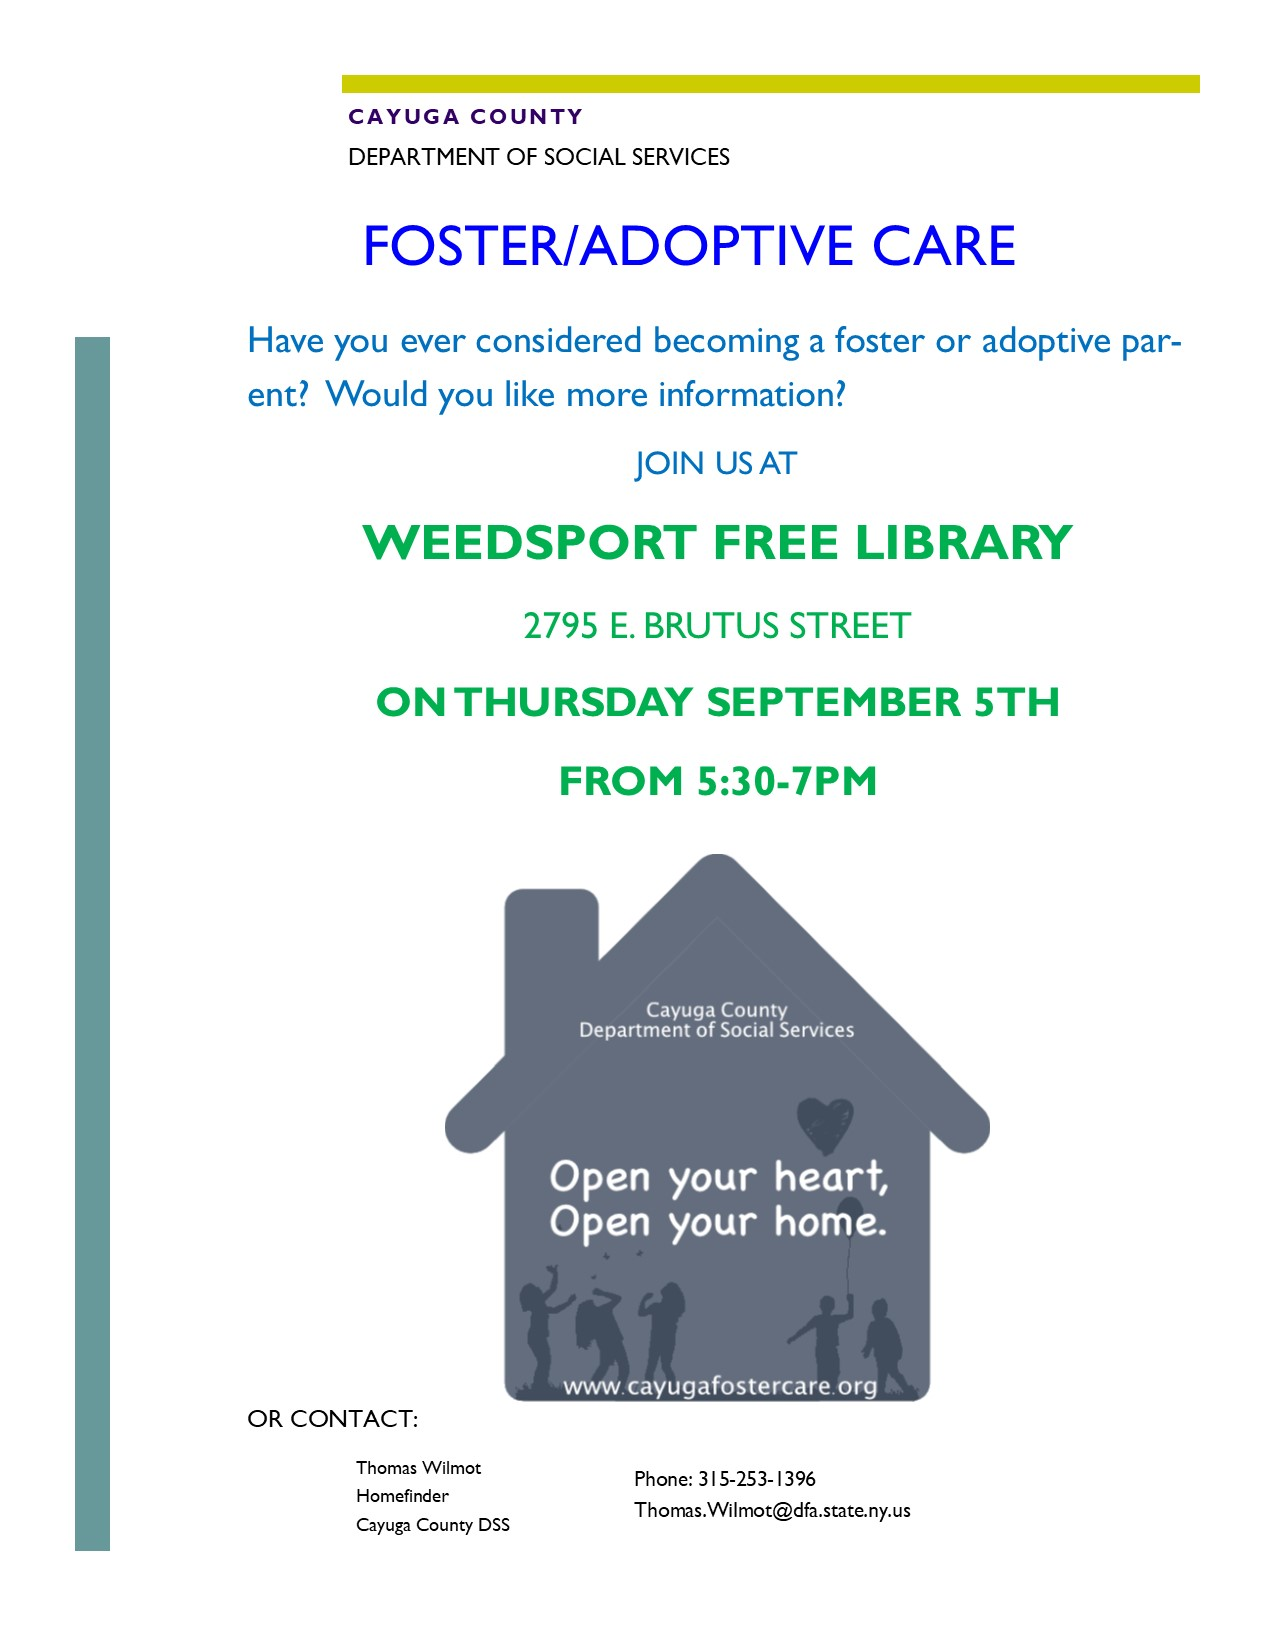 Weedsport Free Library poster.jpg